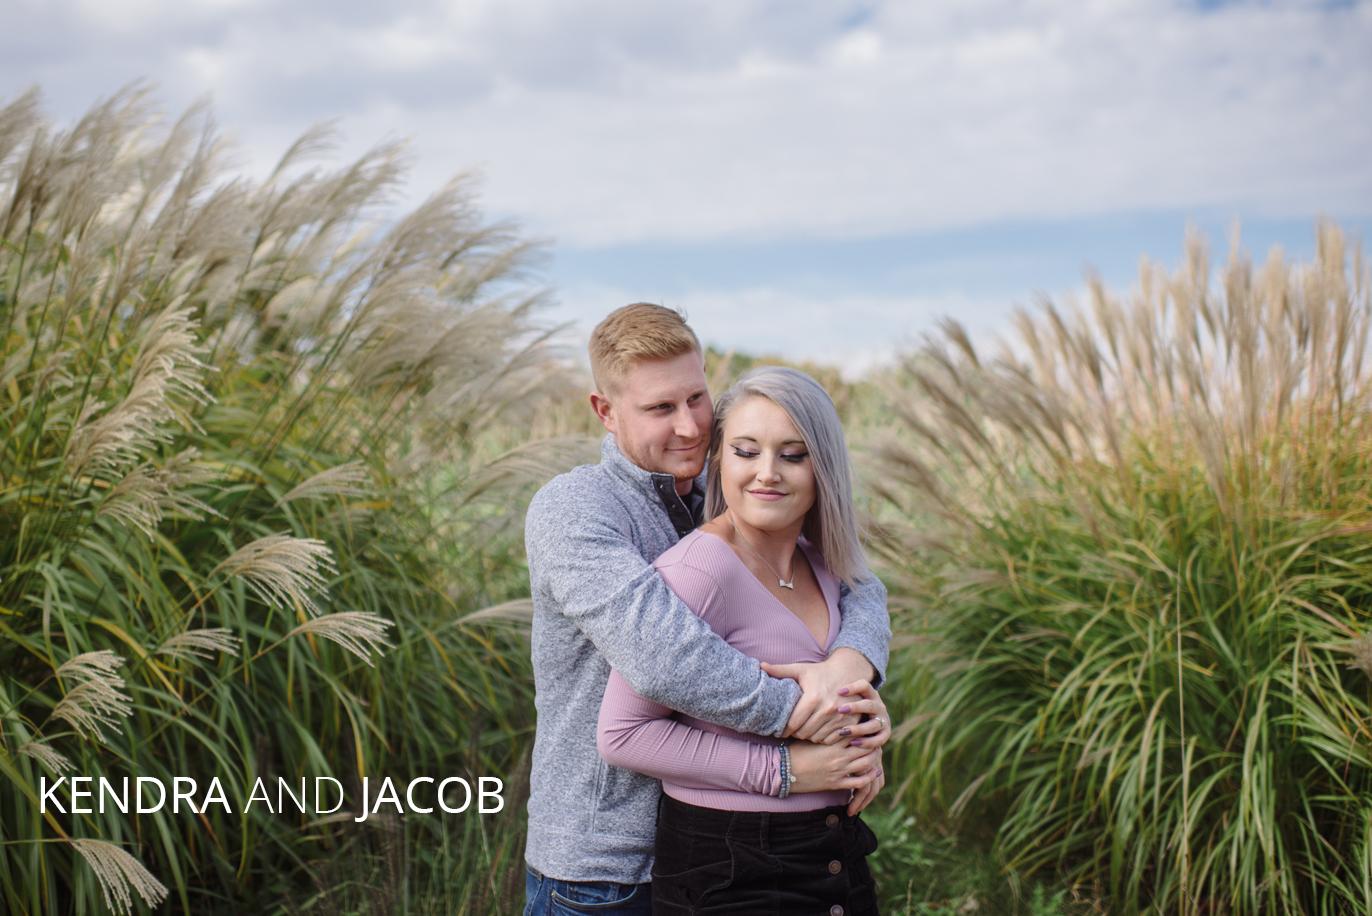 kendra and jacob hug on tartan field golf course